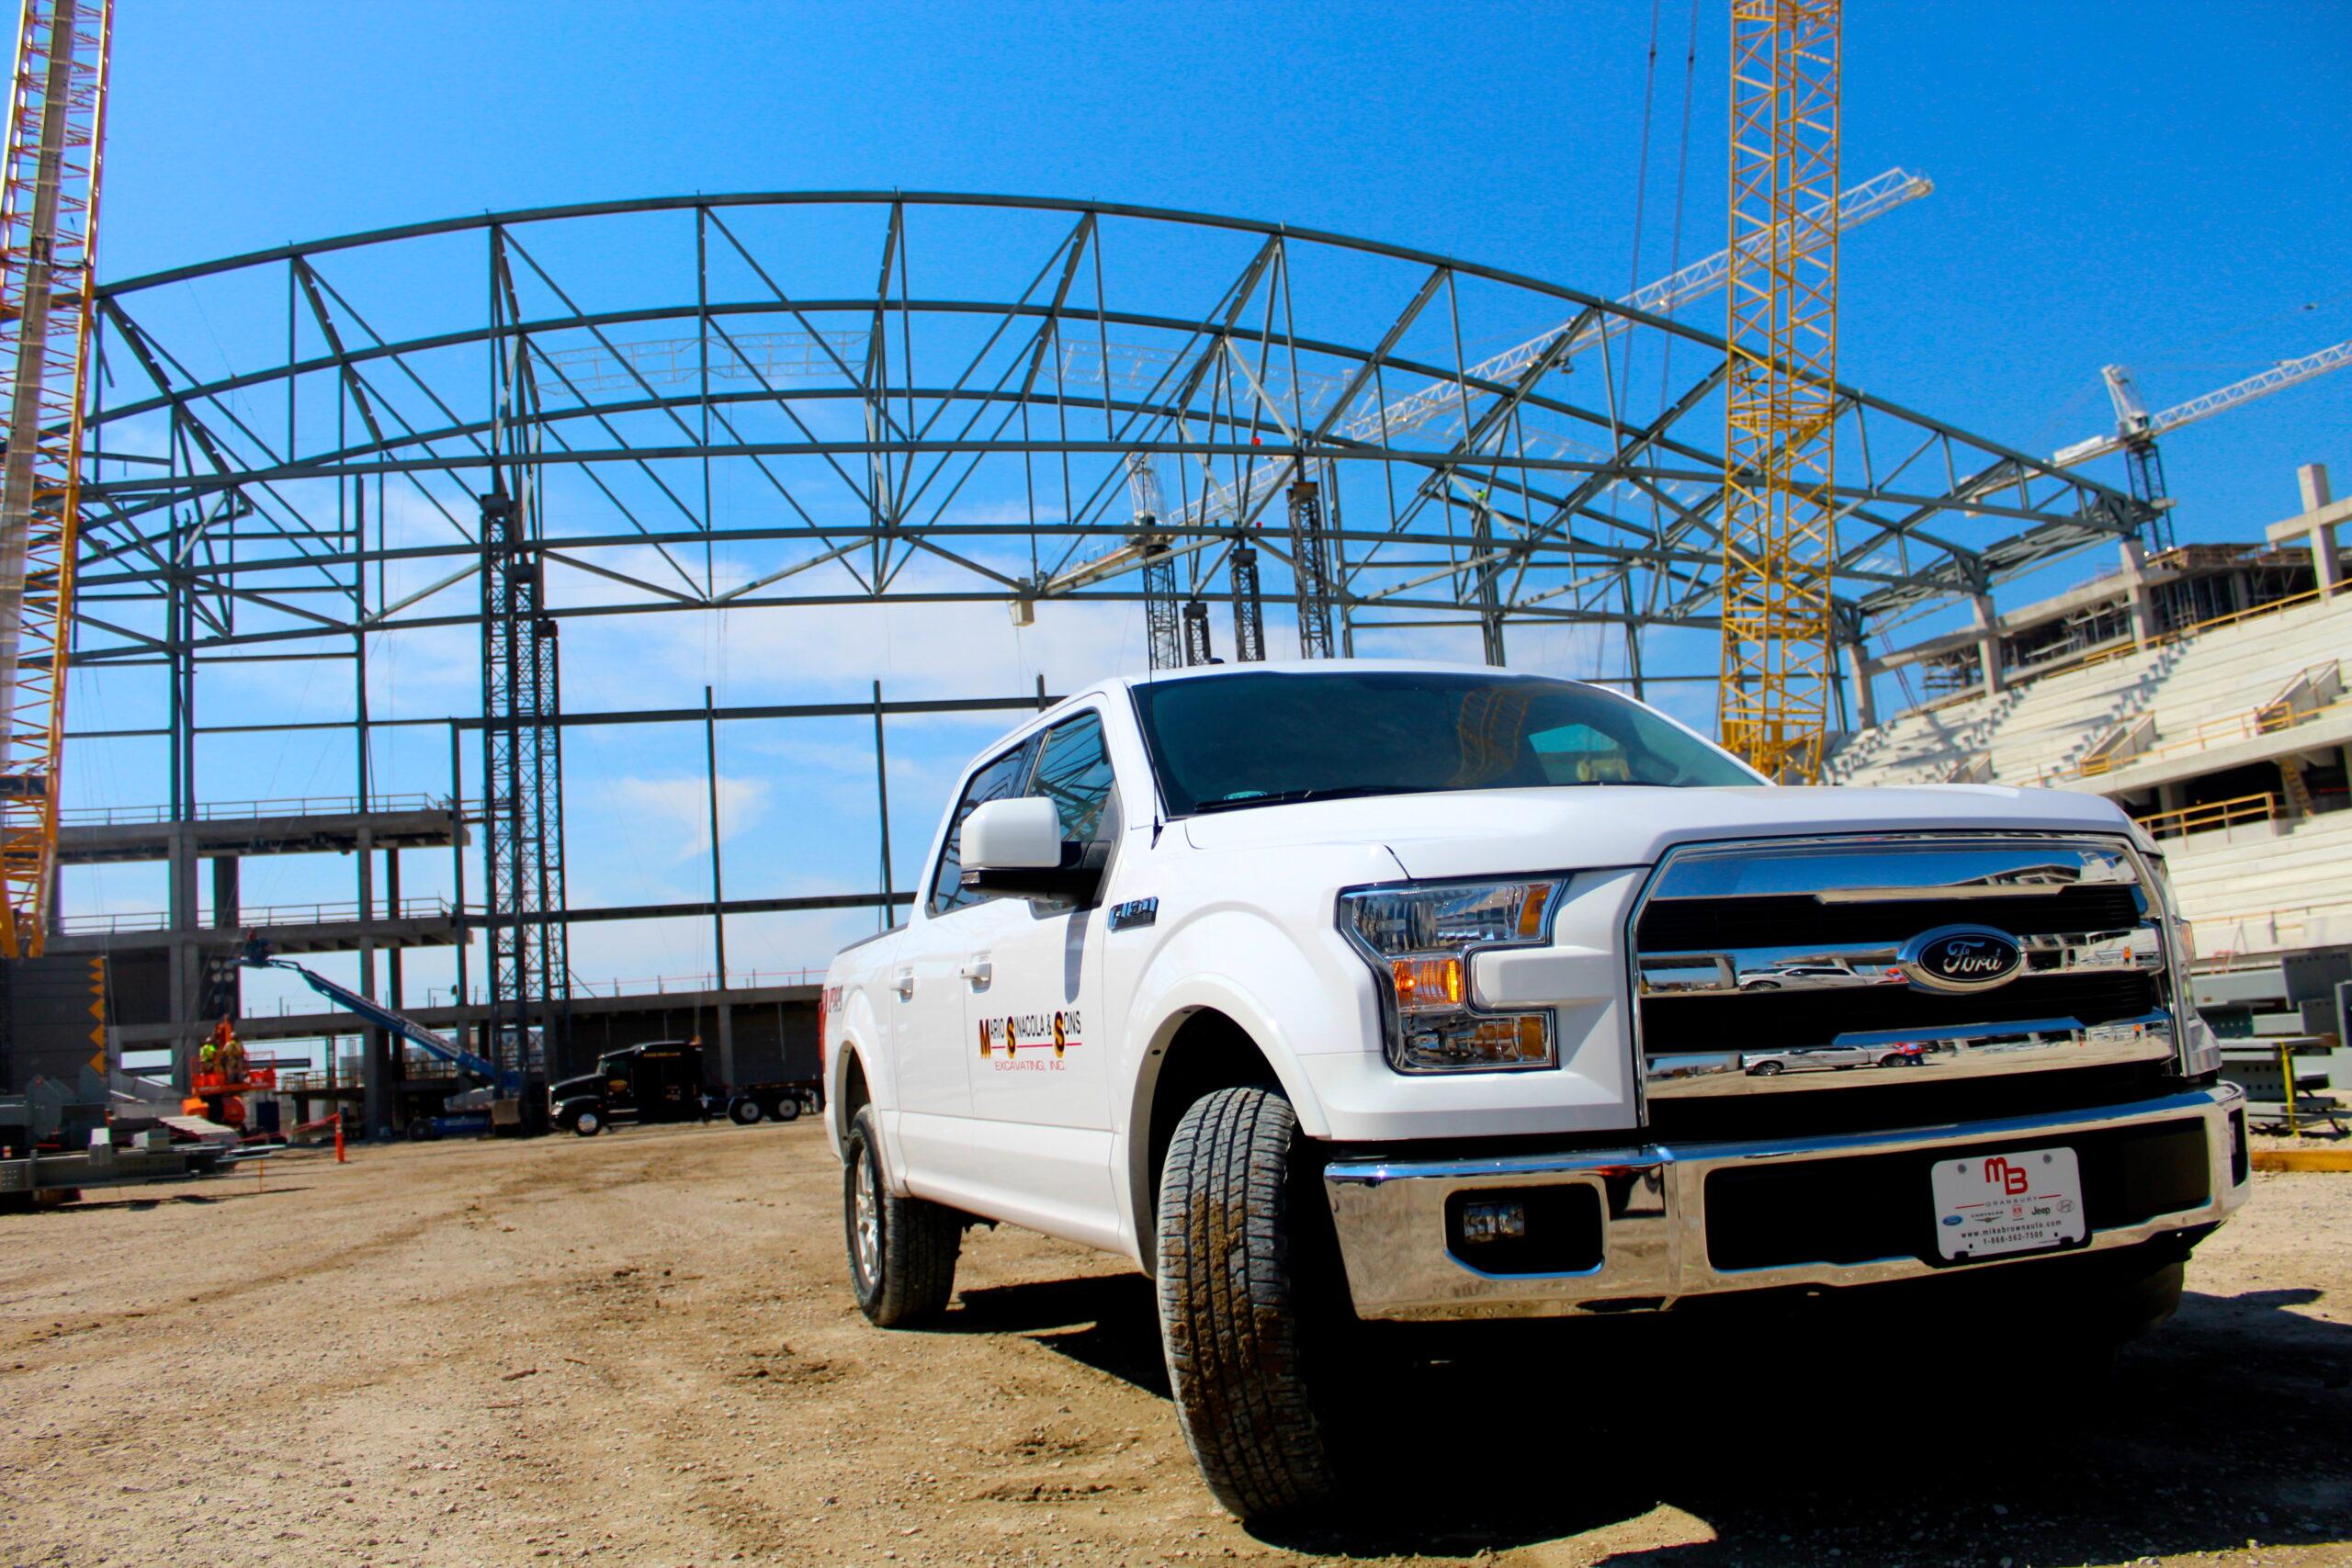 2015 F-150 Dallas Cowboys Stadium Construction